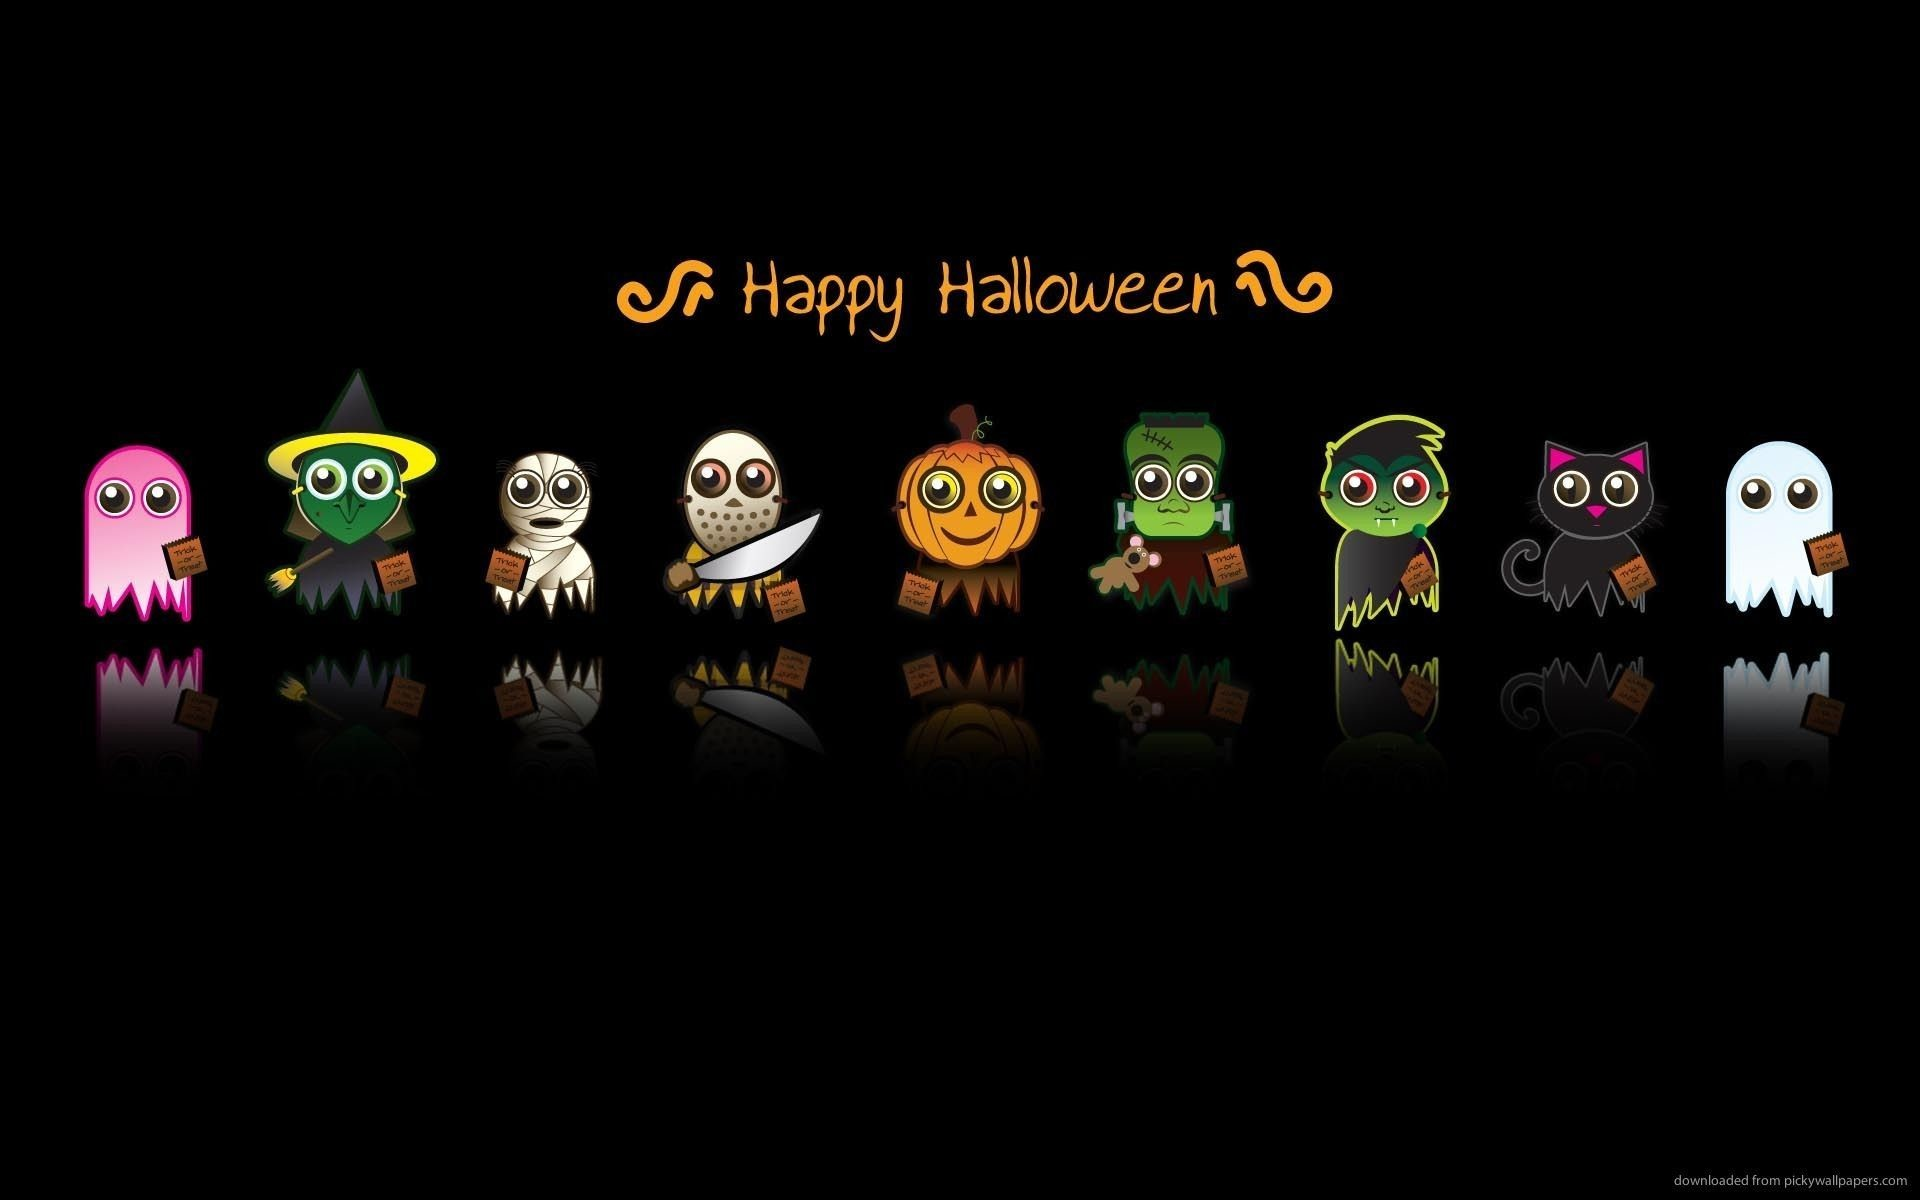 Cute Halloween Wallpaper for Desktop 66 images 1920x1200